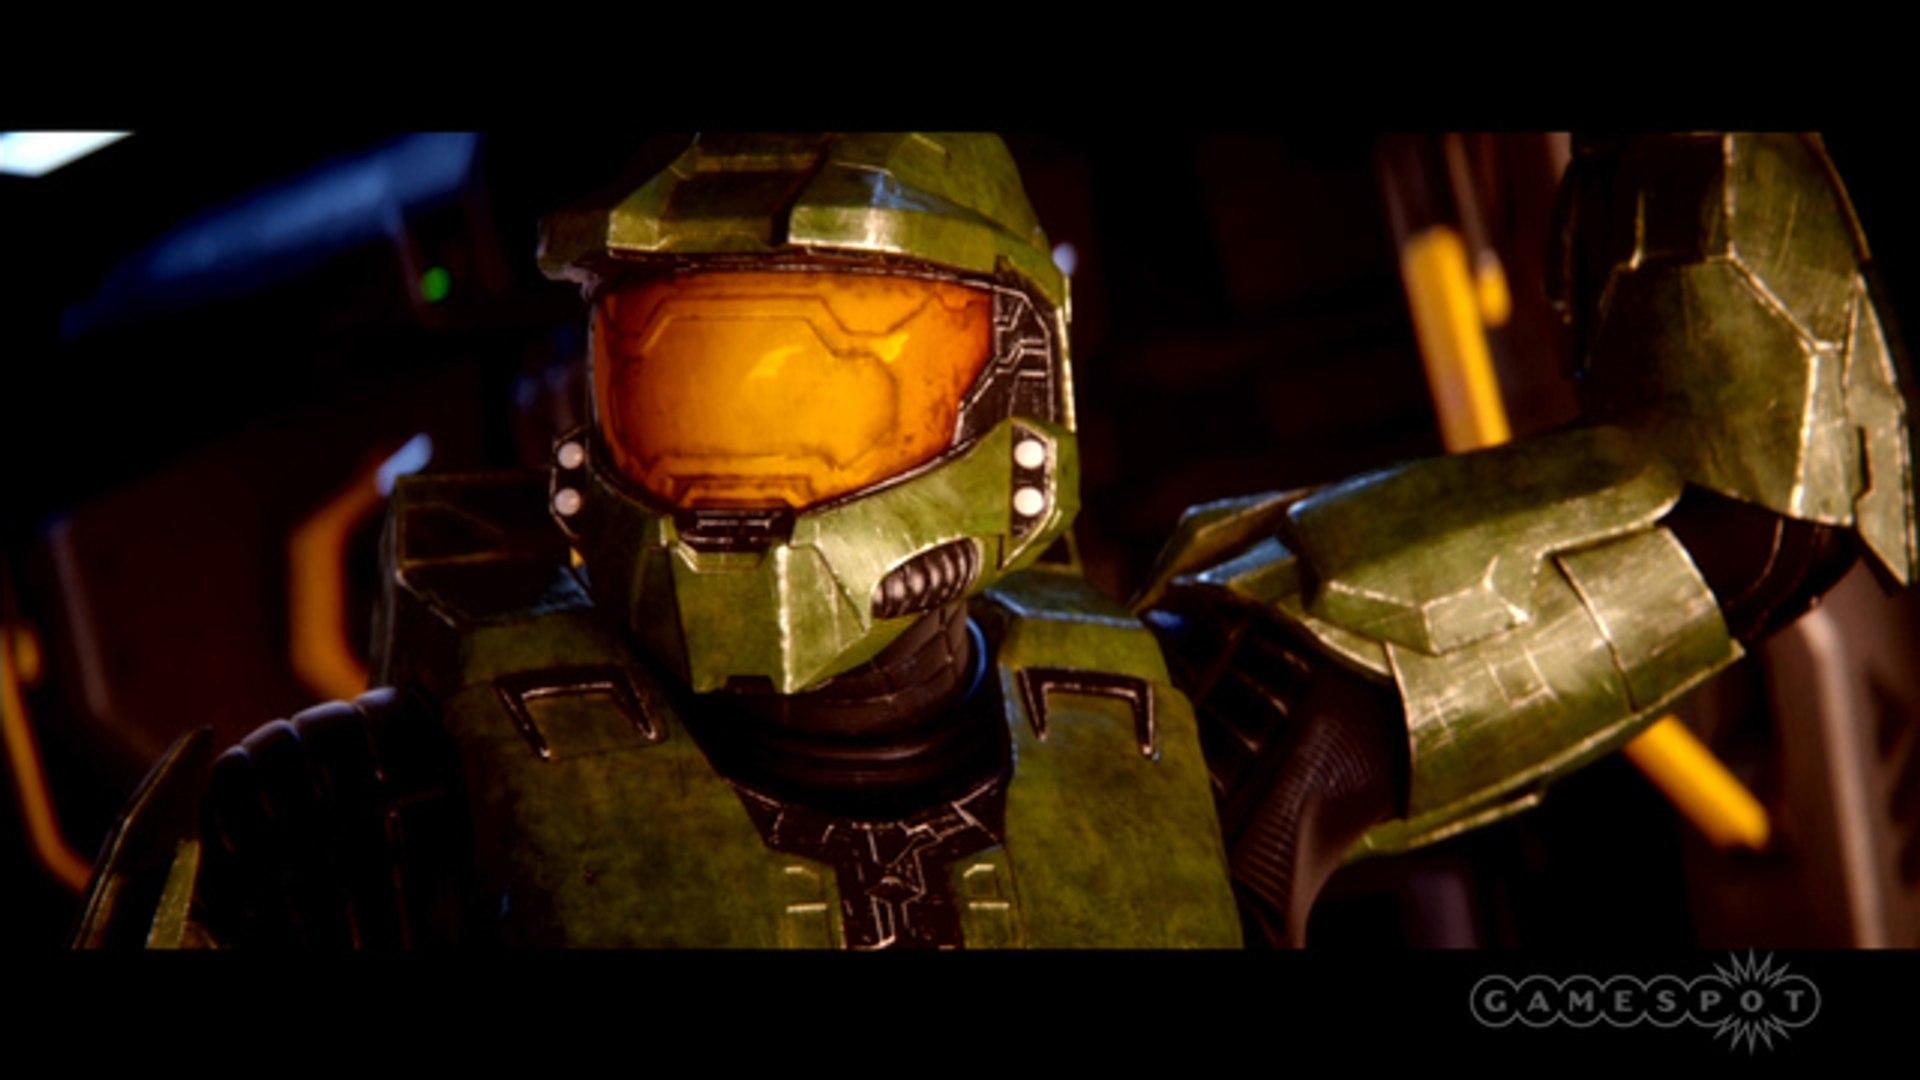 Halo 2: Anniversary Cutscene and New Mombasa Fight